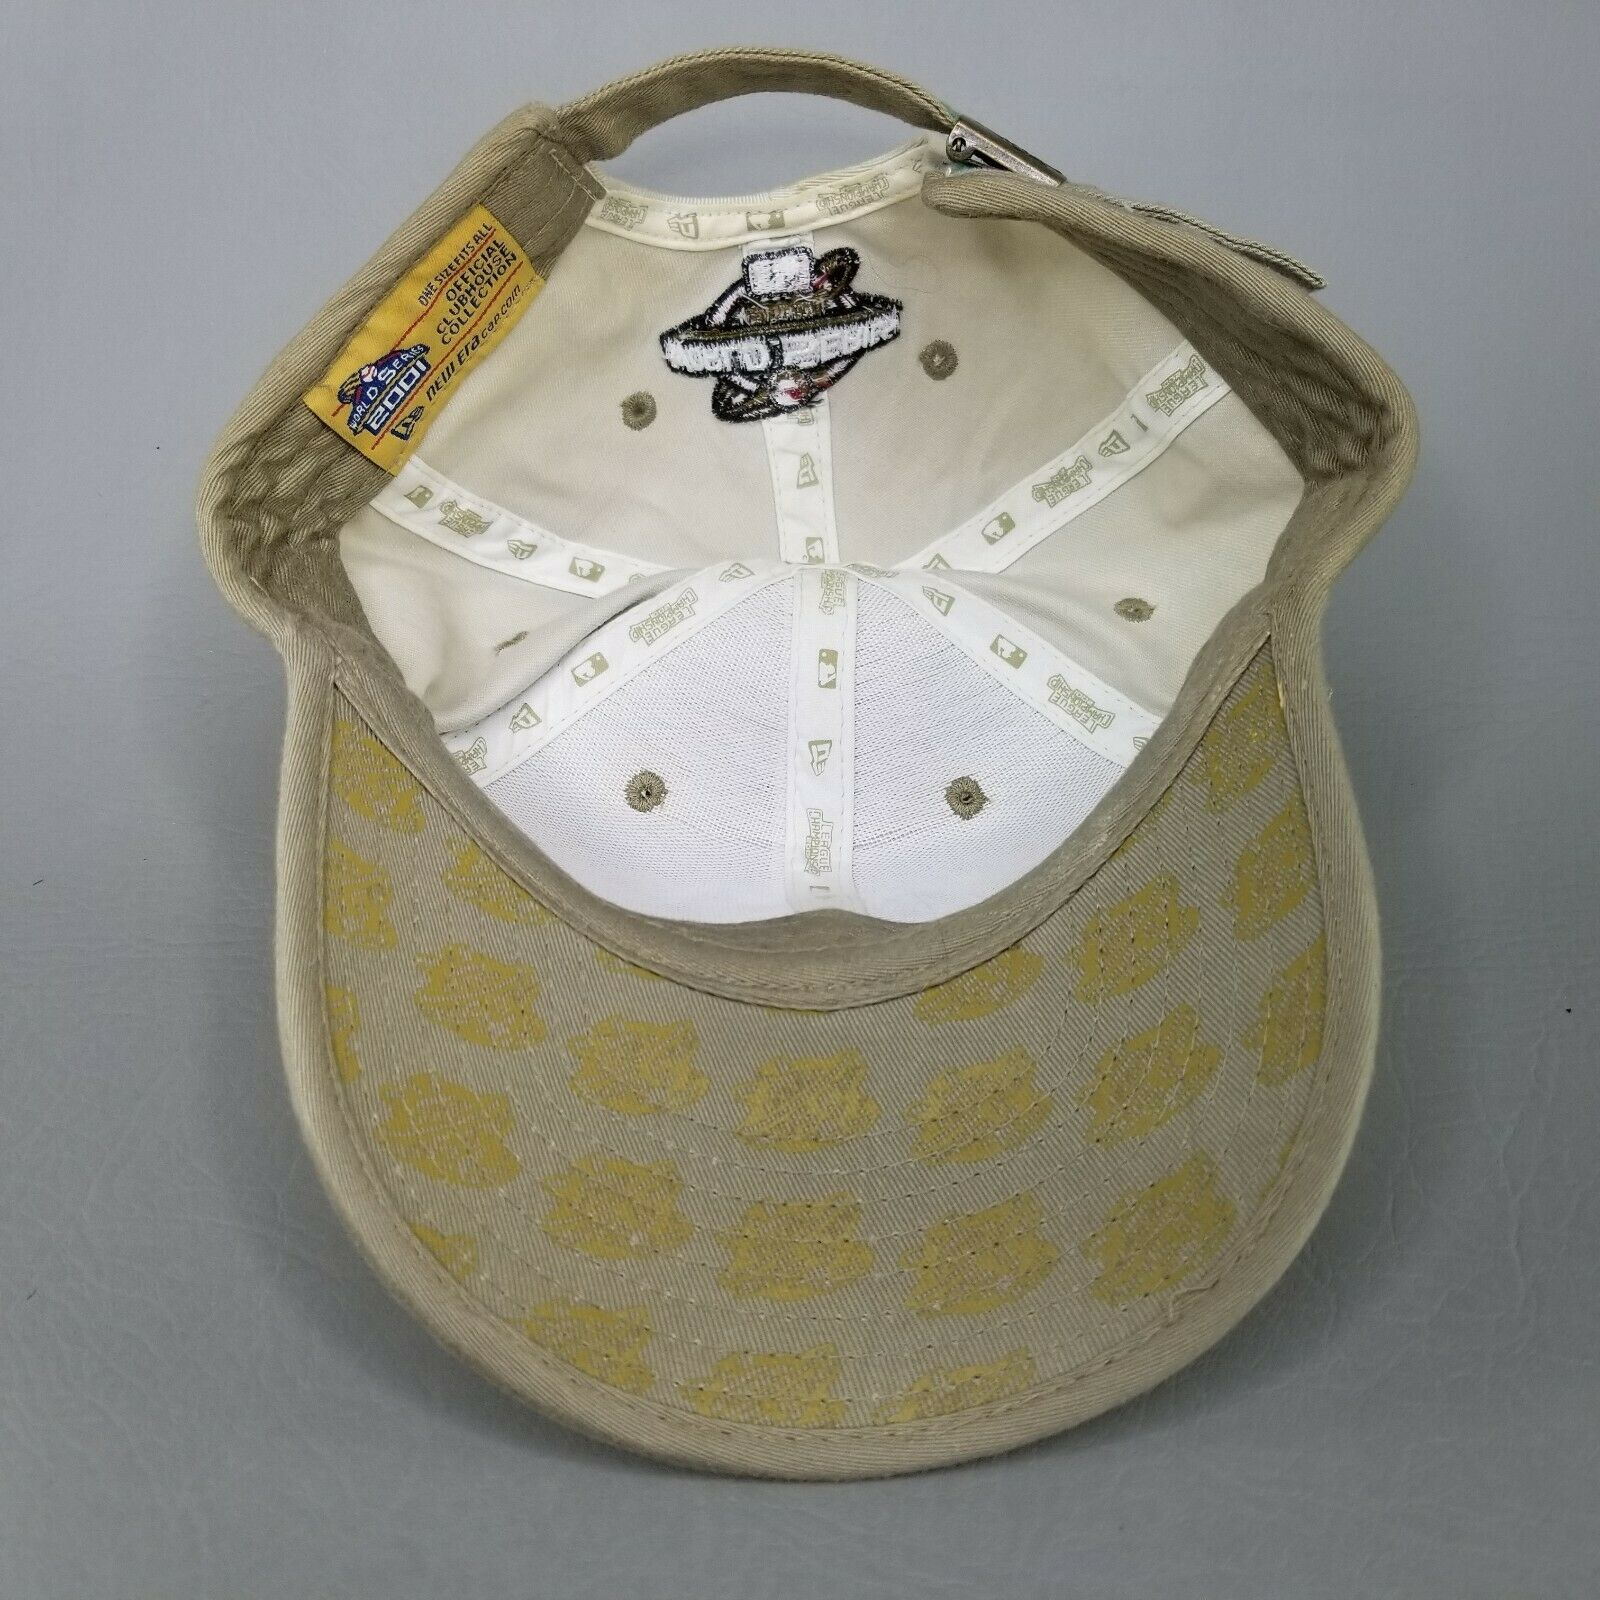 Arizona Diamondbacks New Era Baseball Hat 2001 League Champions World Series image 7